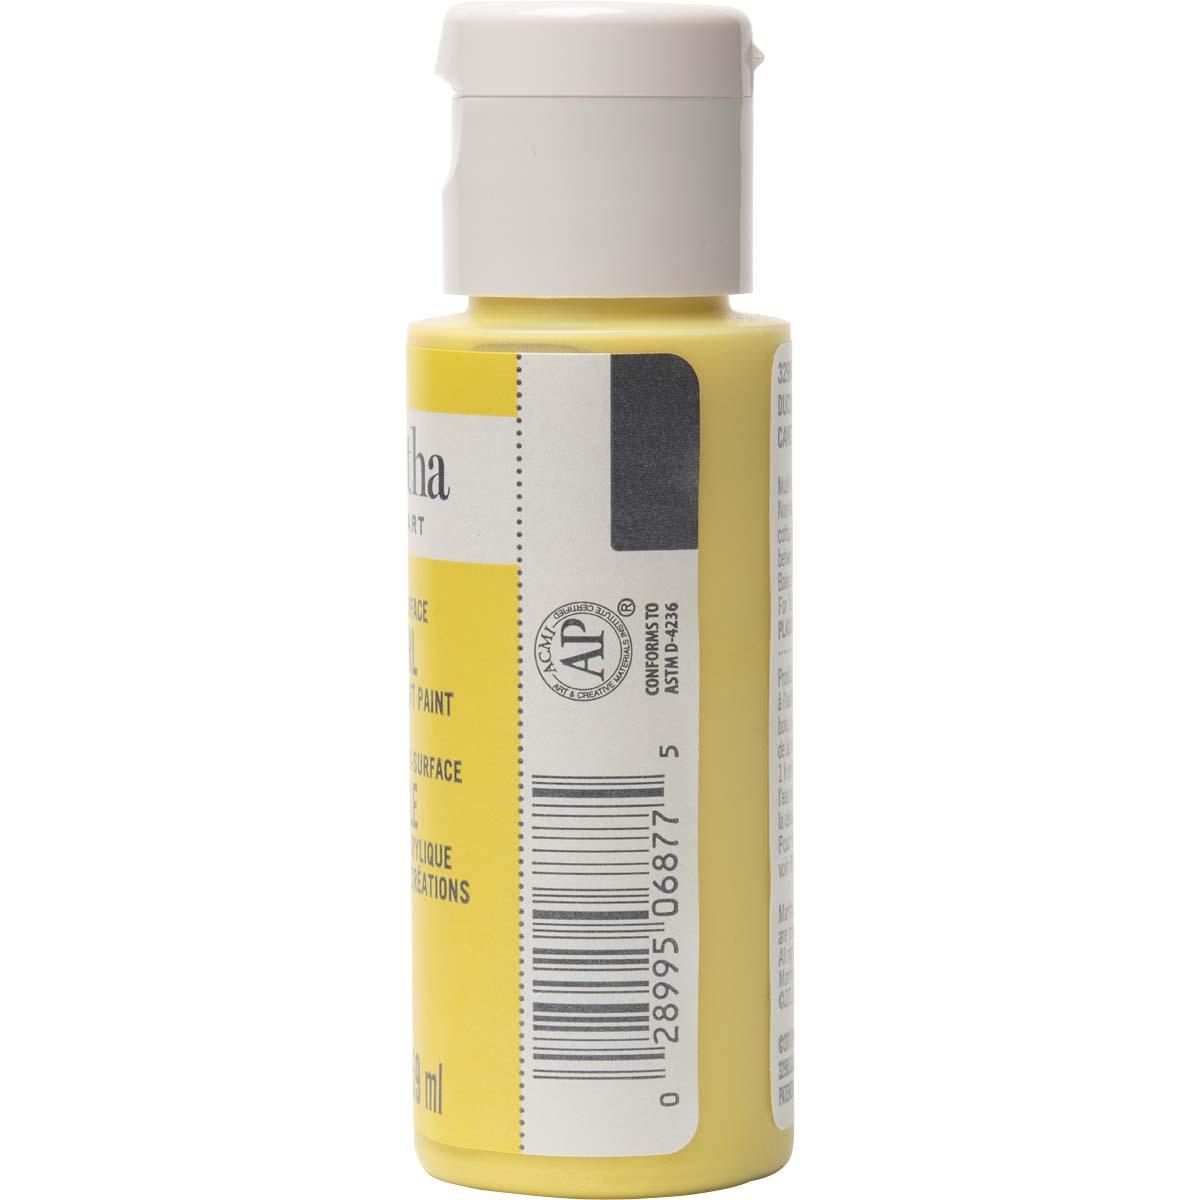 Martha Stewart ® Multi-Surface Pearl Acrylic Craft Paint - Duckling, 2 oz. - 32965CA